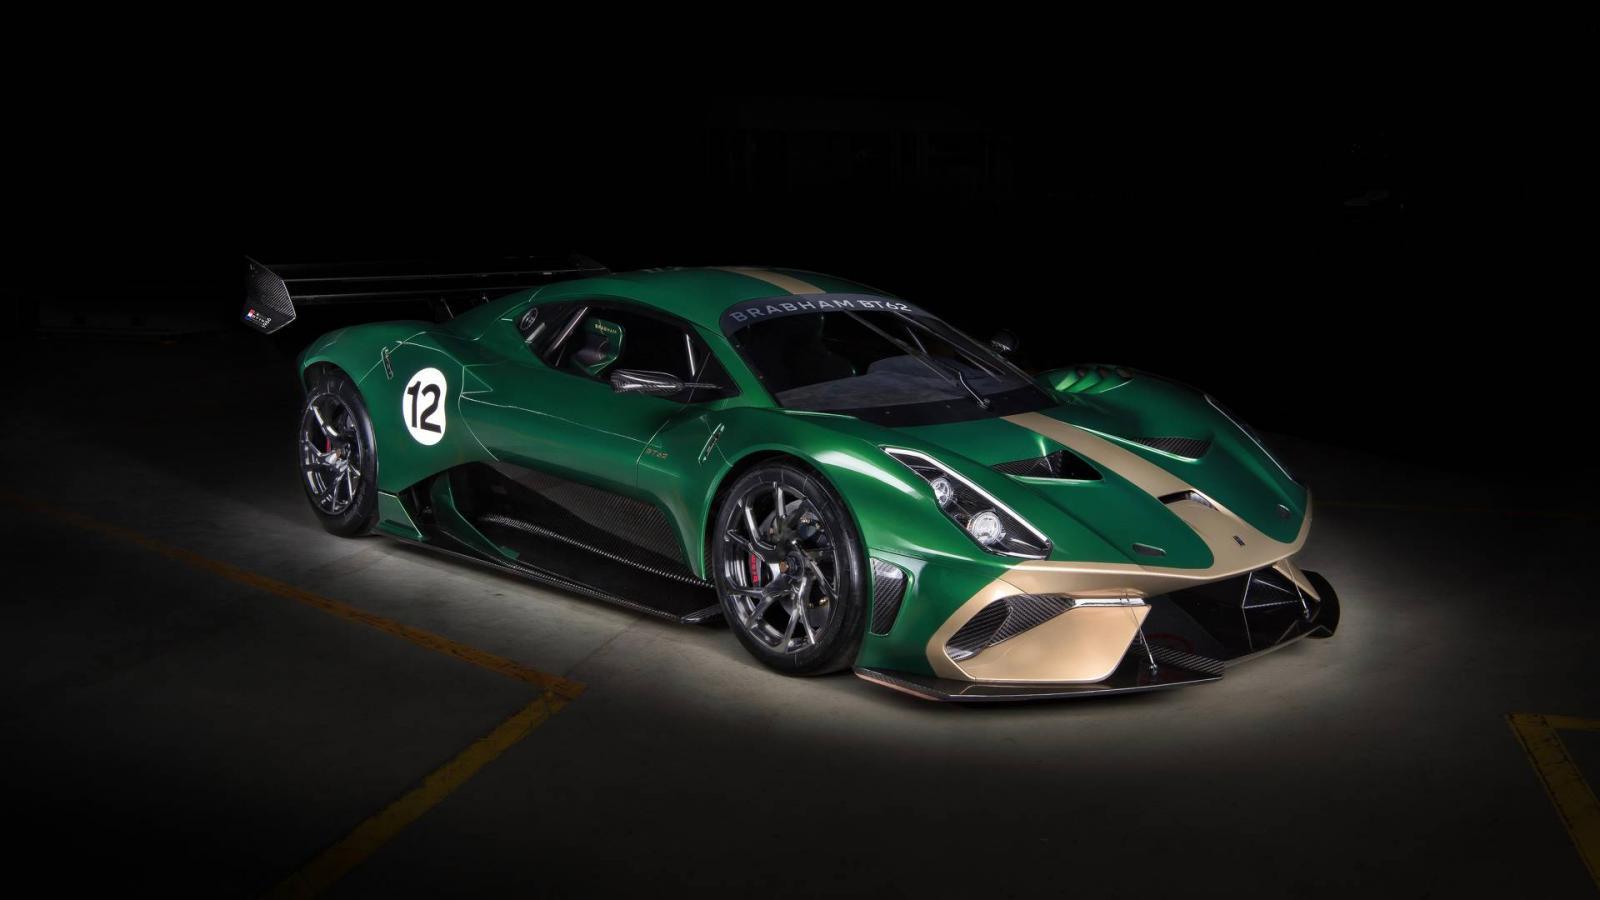 Brabham презентовала суперкар BT62 за85 млн руб.